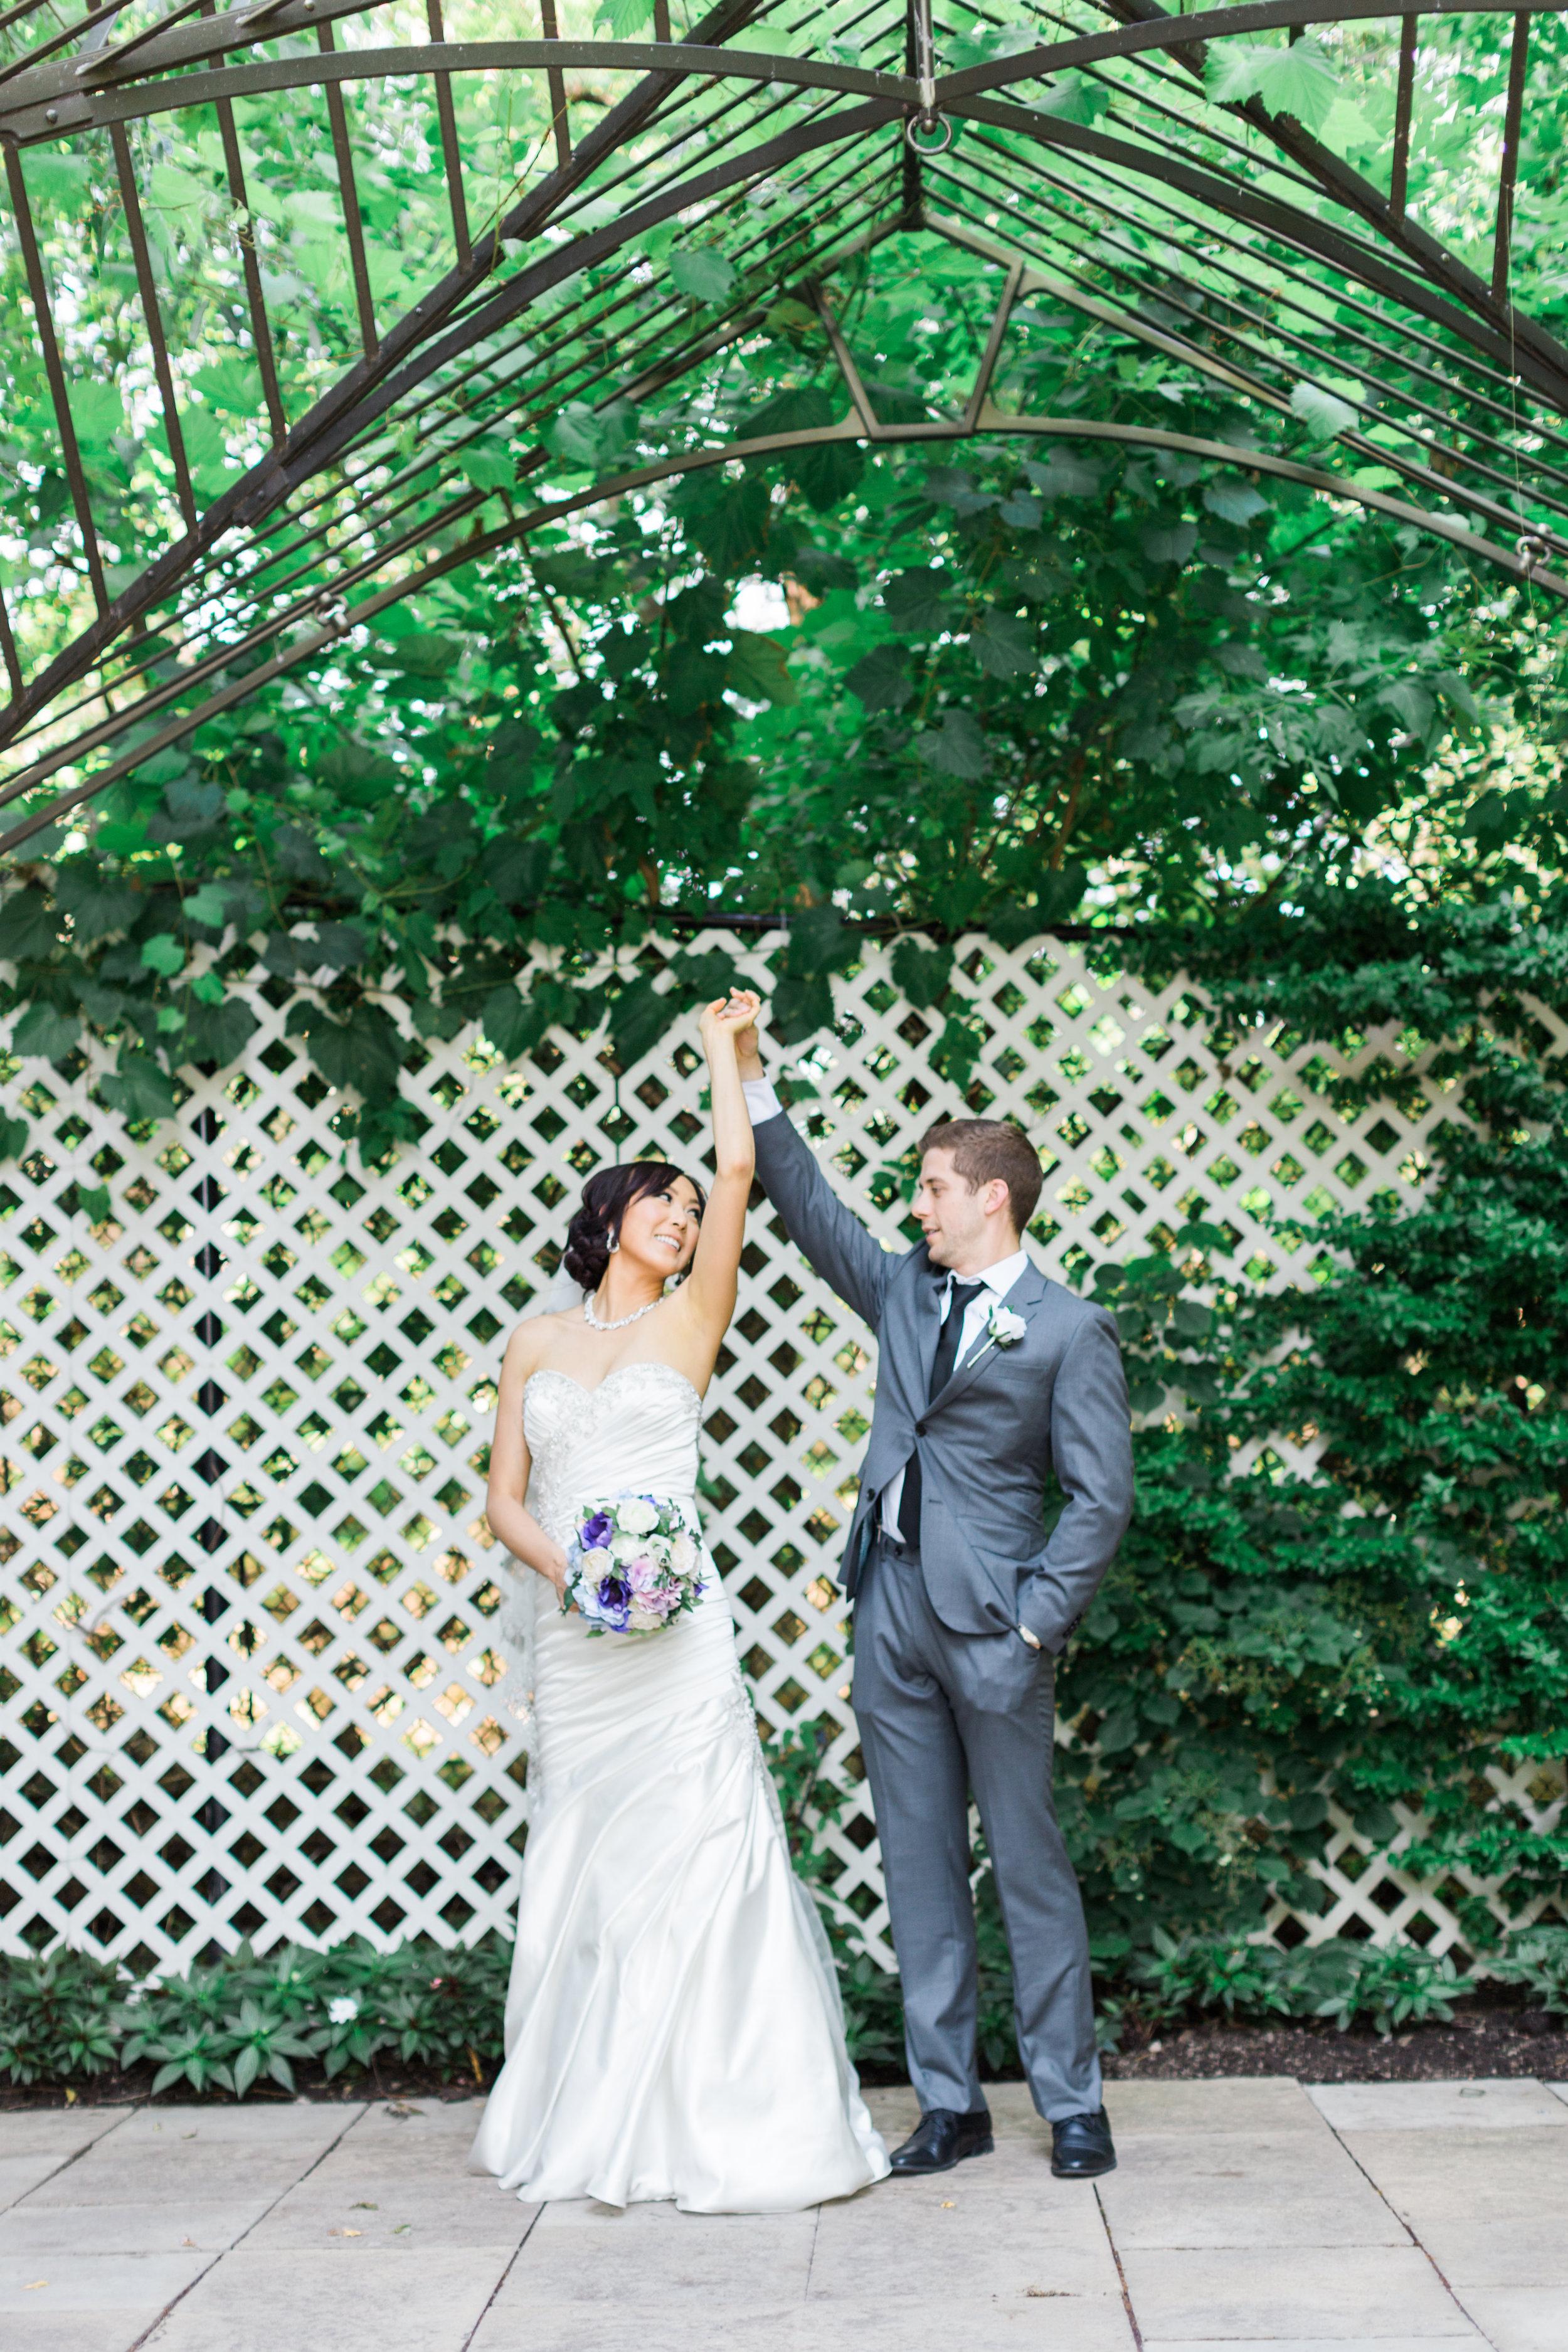 Toronto Fine Art Photographer - Old Mill Wedding - Bride & Groom Photos-8.jpg